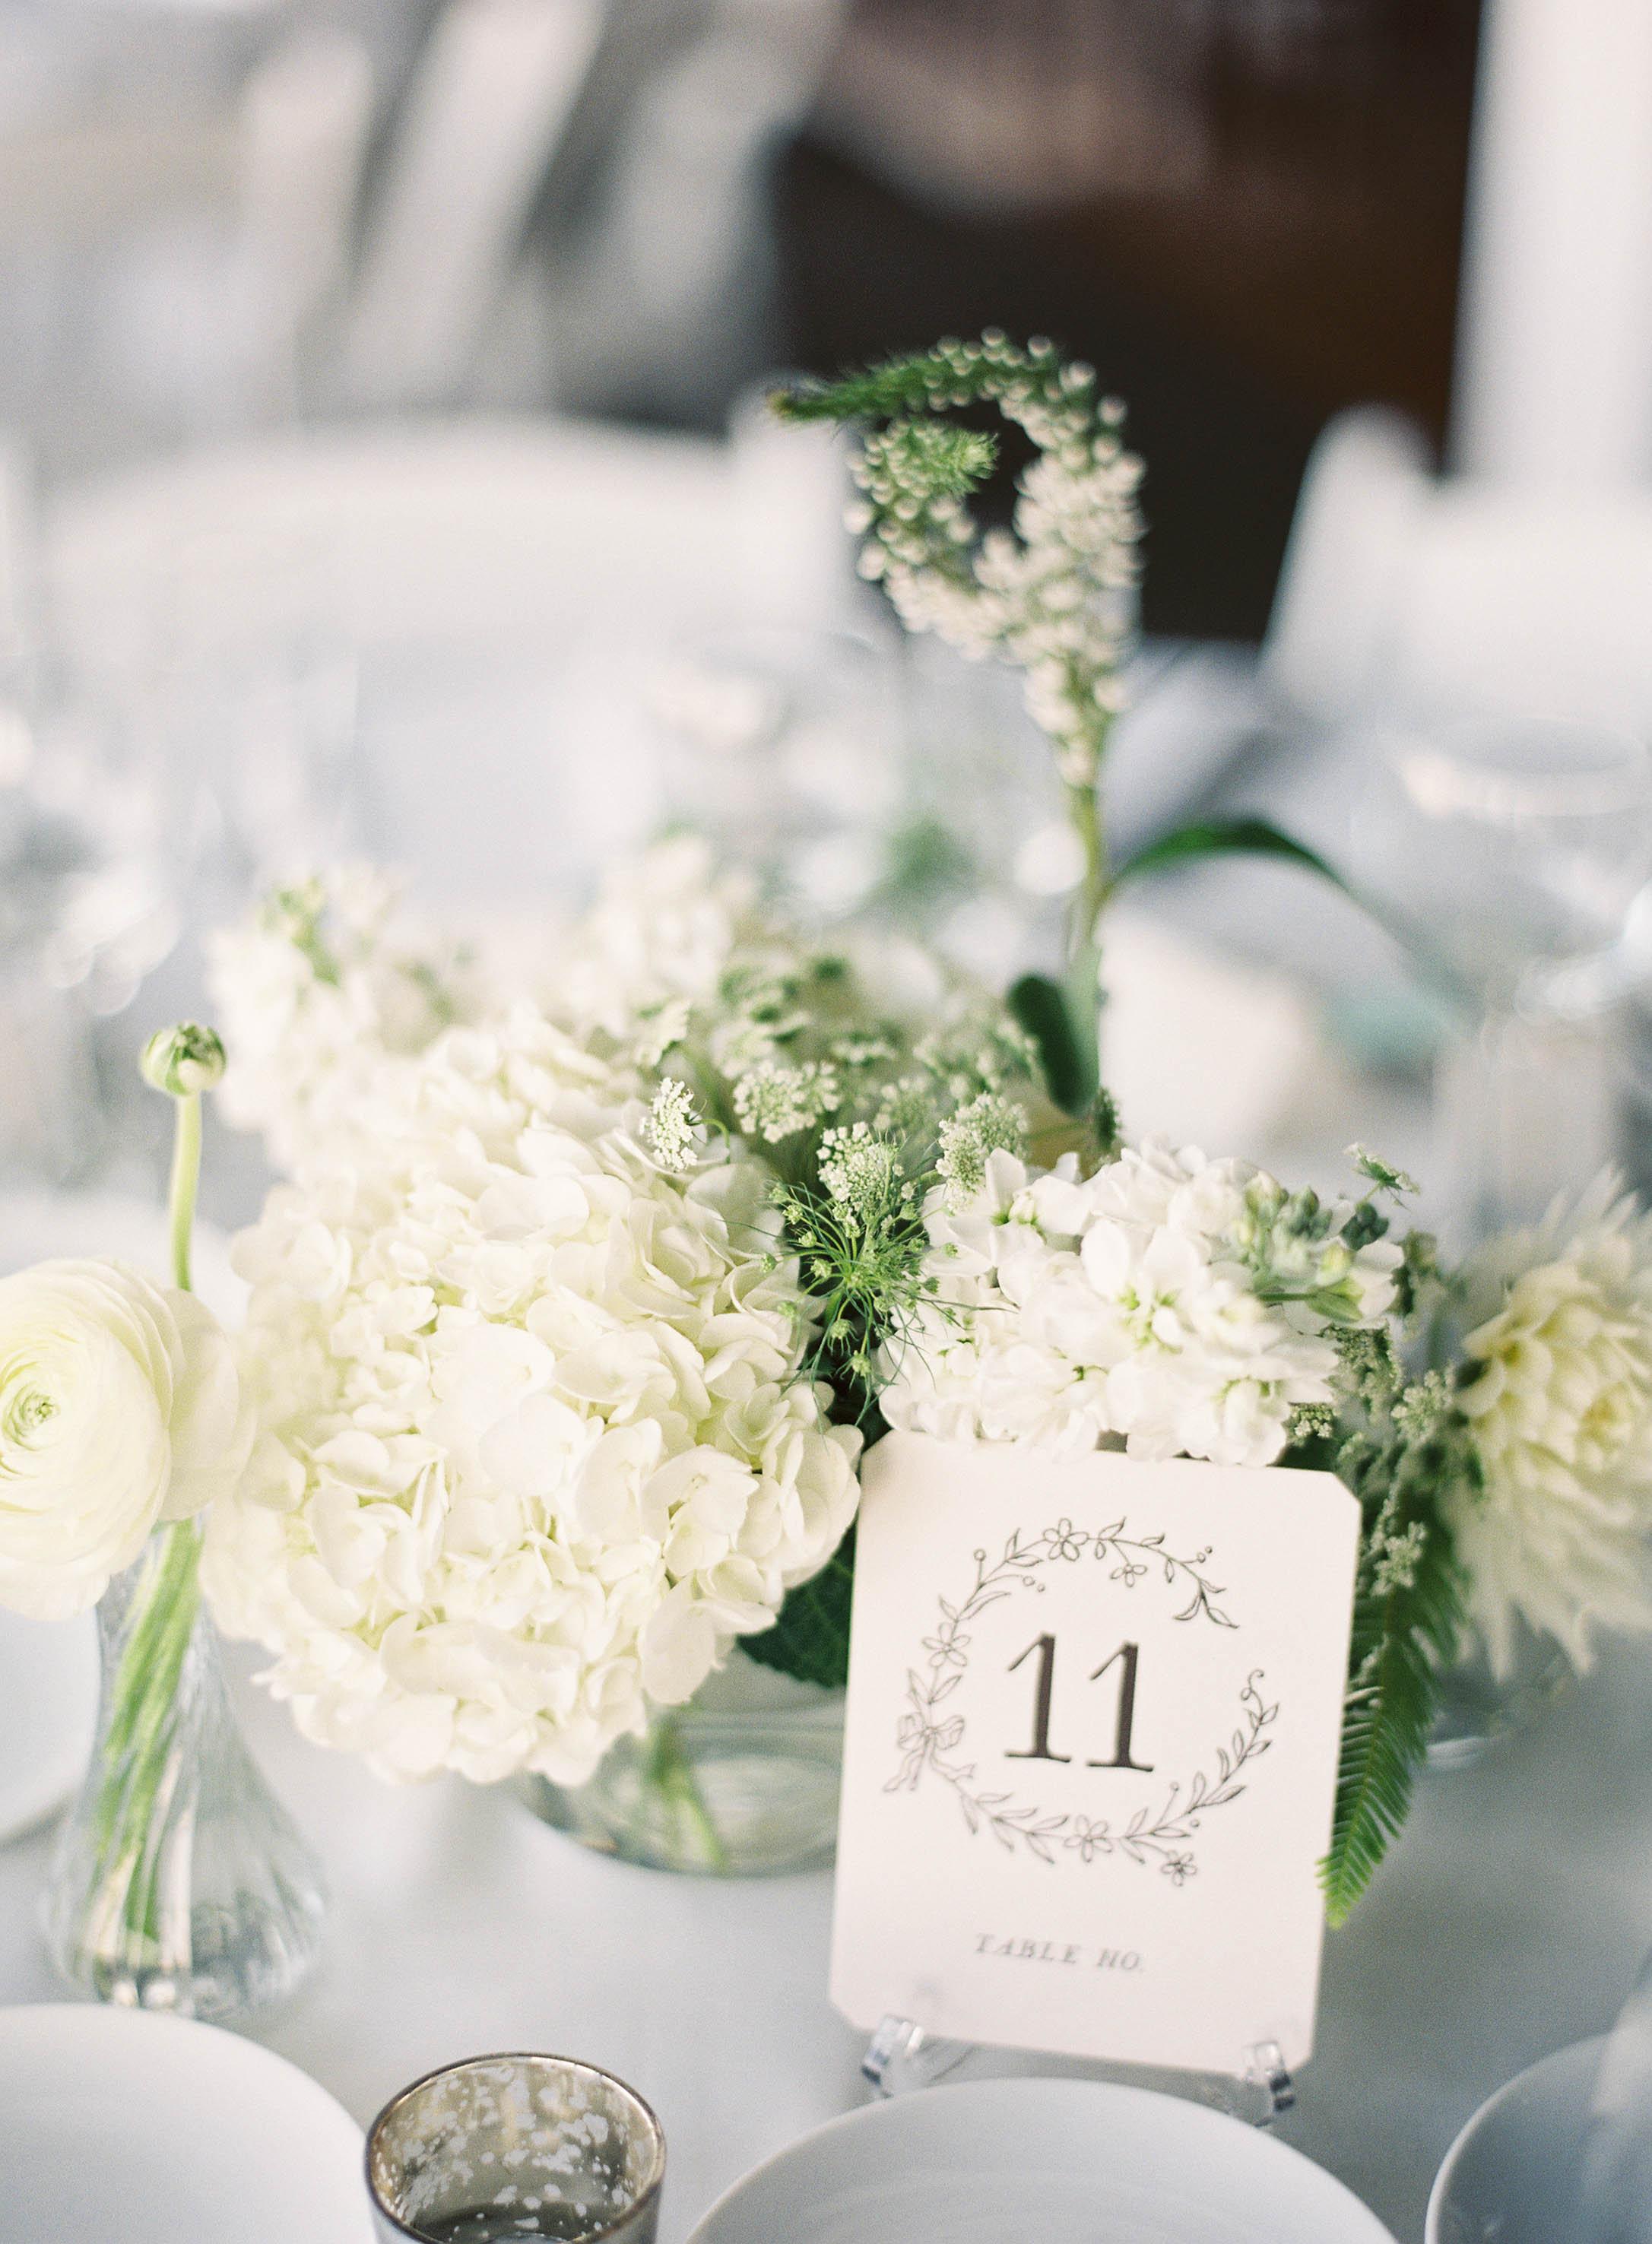 White hydrangea multiple centerpieces